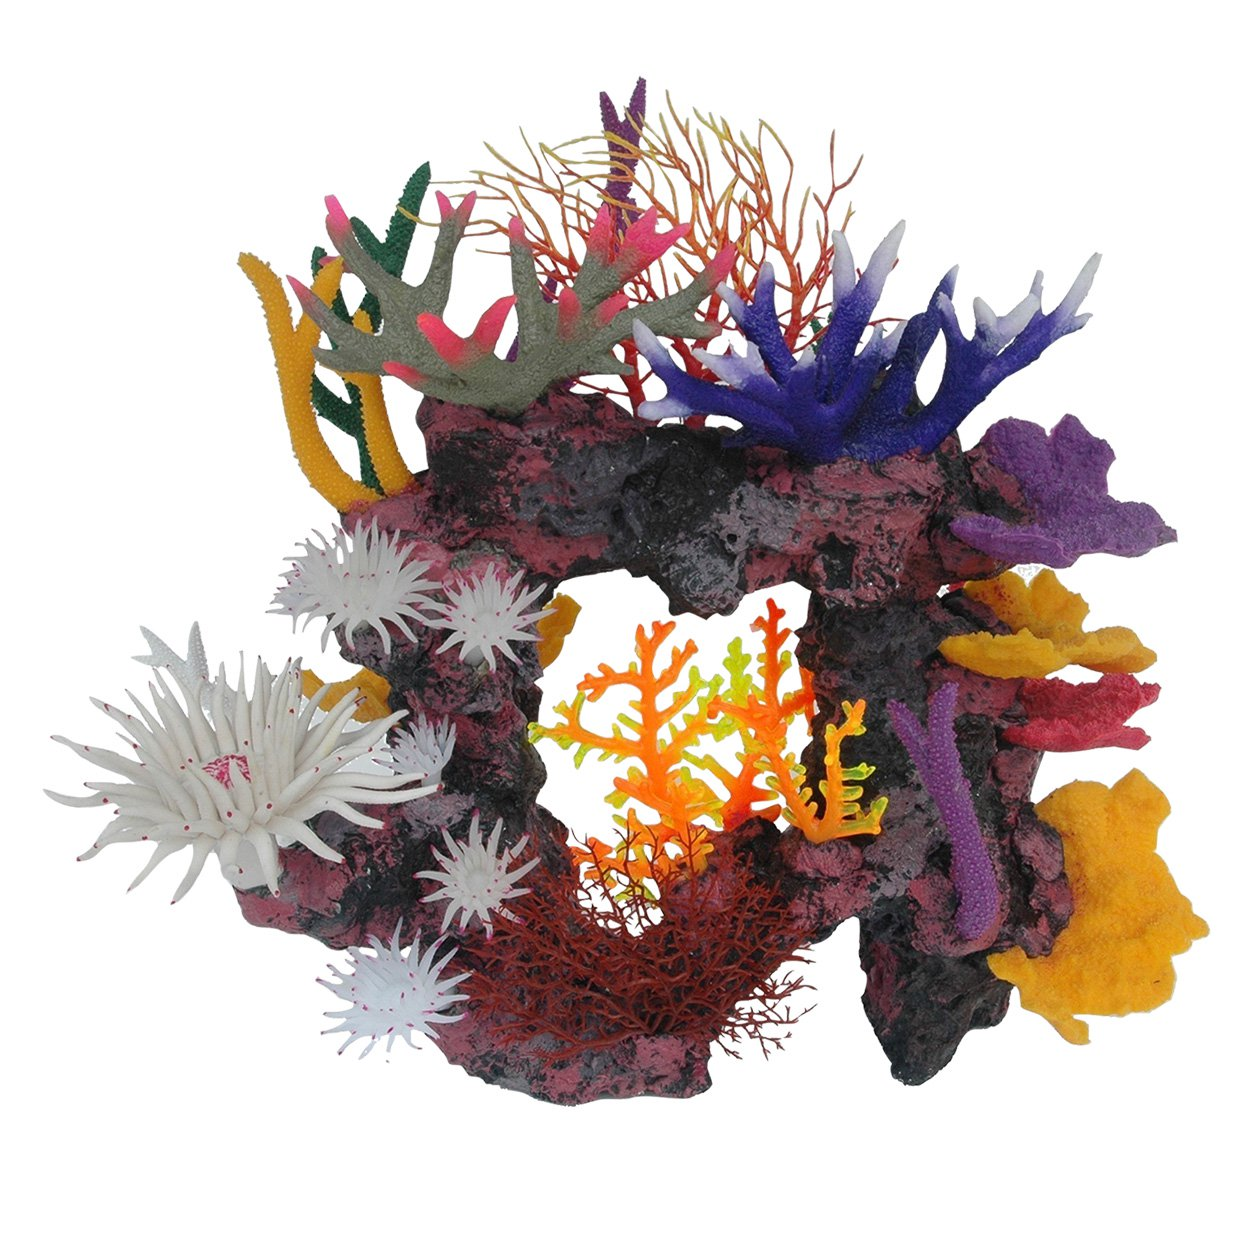 Underwater Treasures Deepwater Coral Cavern